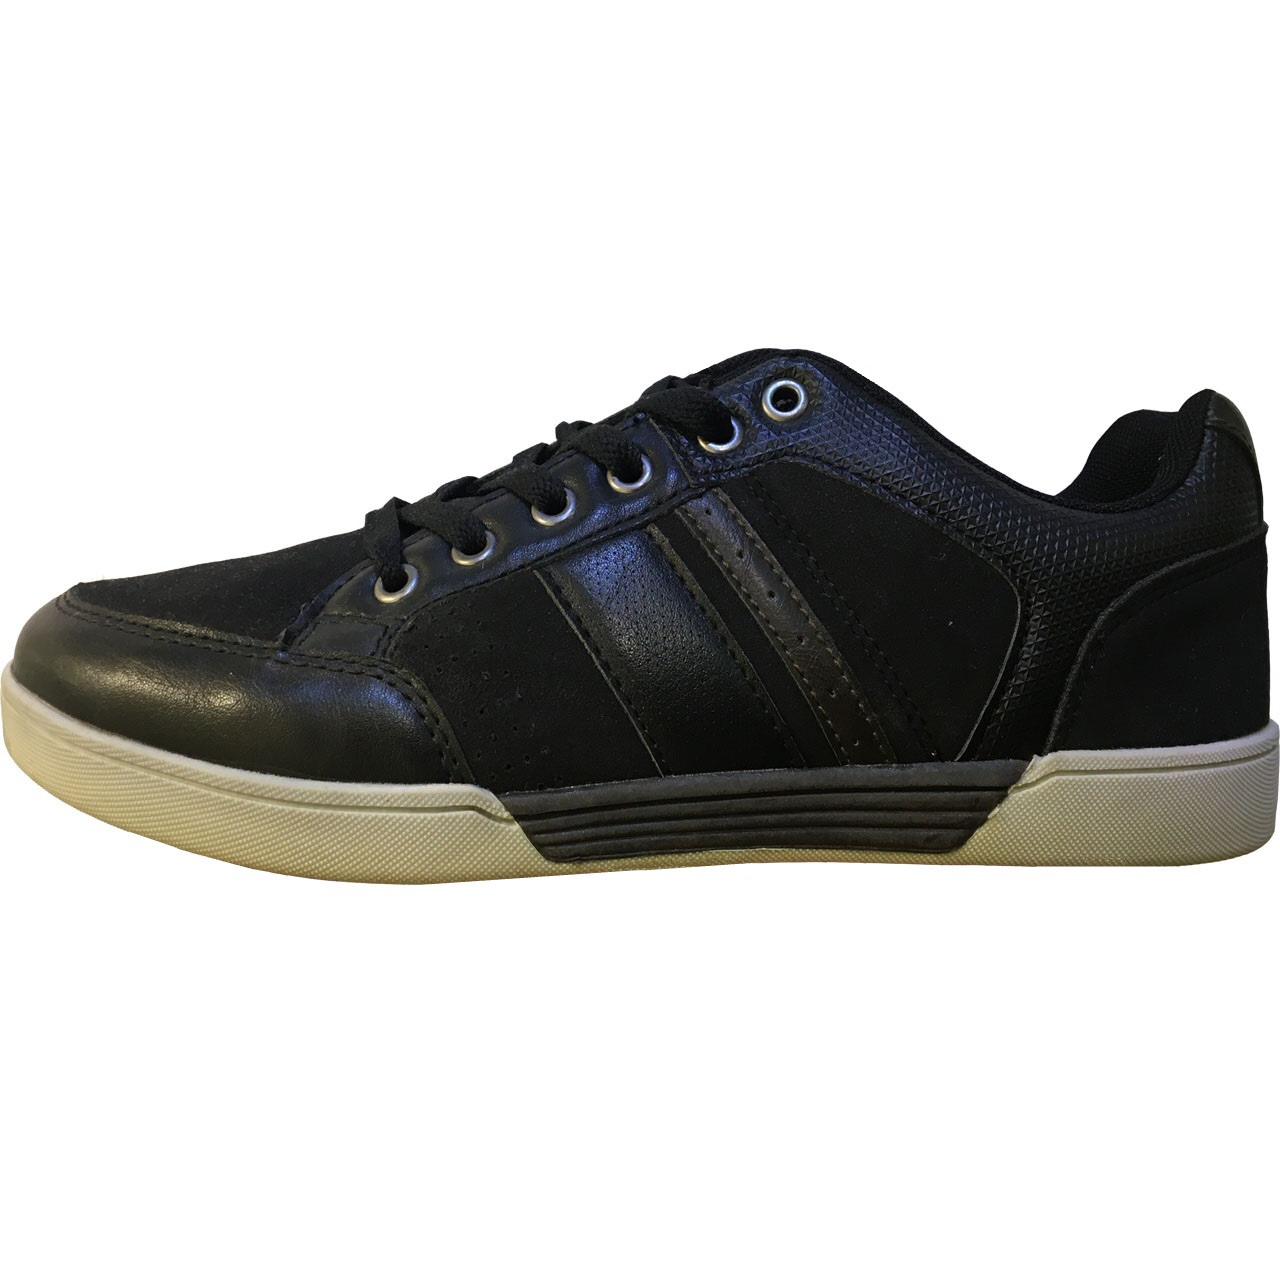 کفش روزمره مردانه لیورجی مدل a125